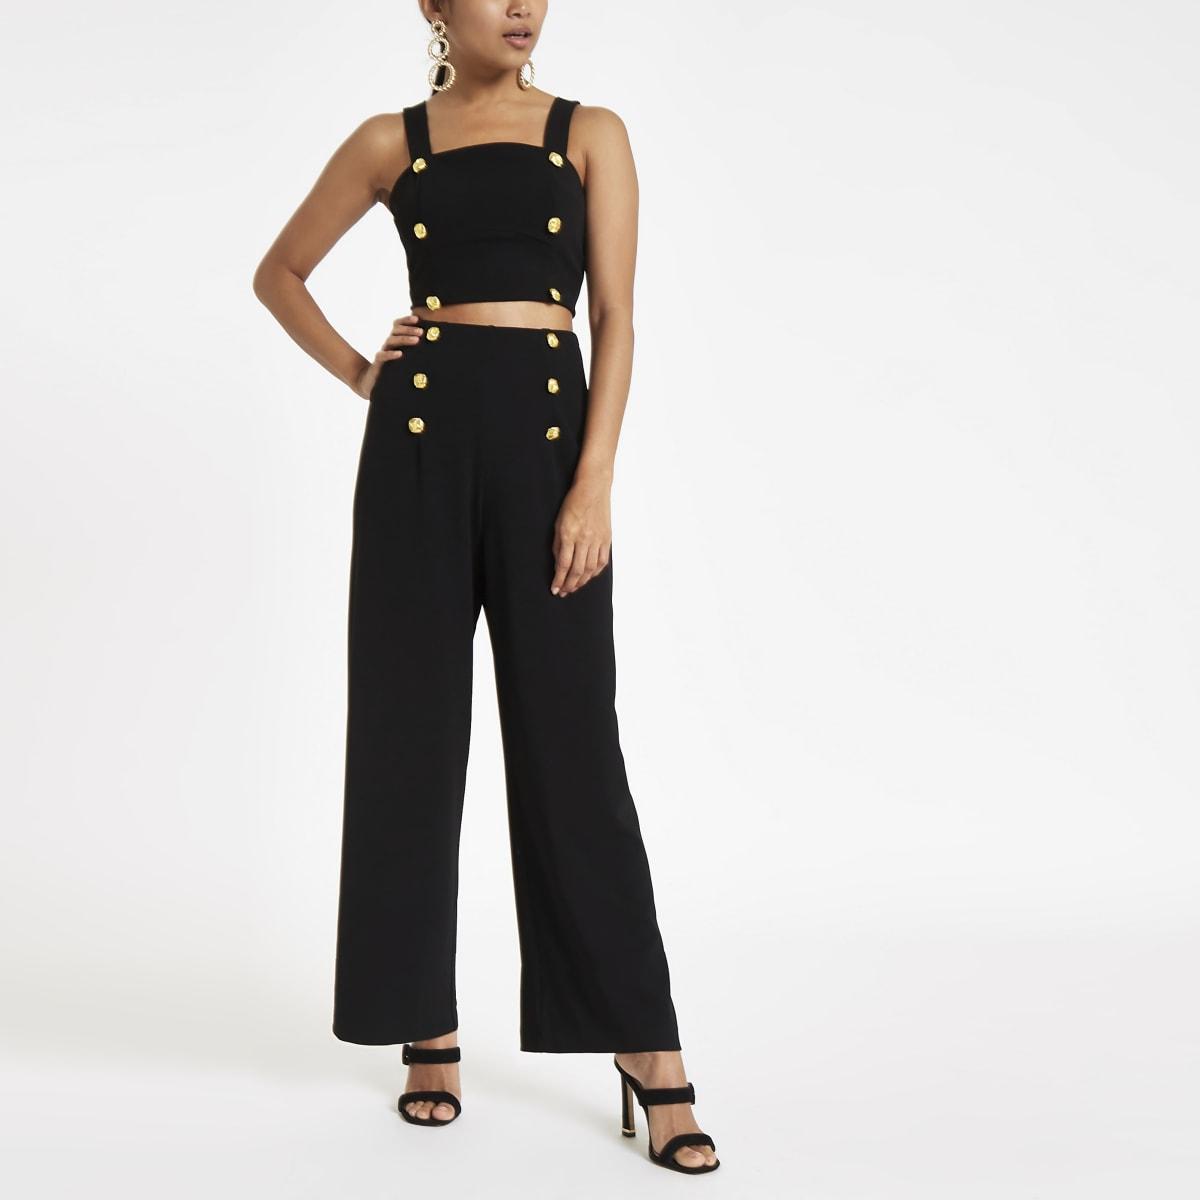 Petite black wide leg high waisted pants